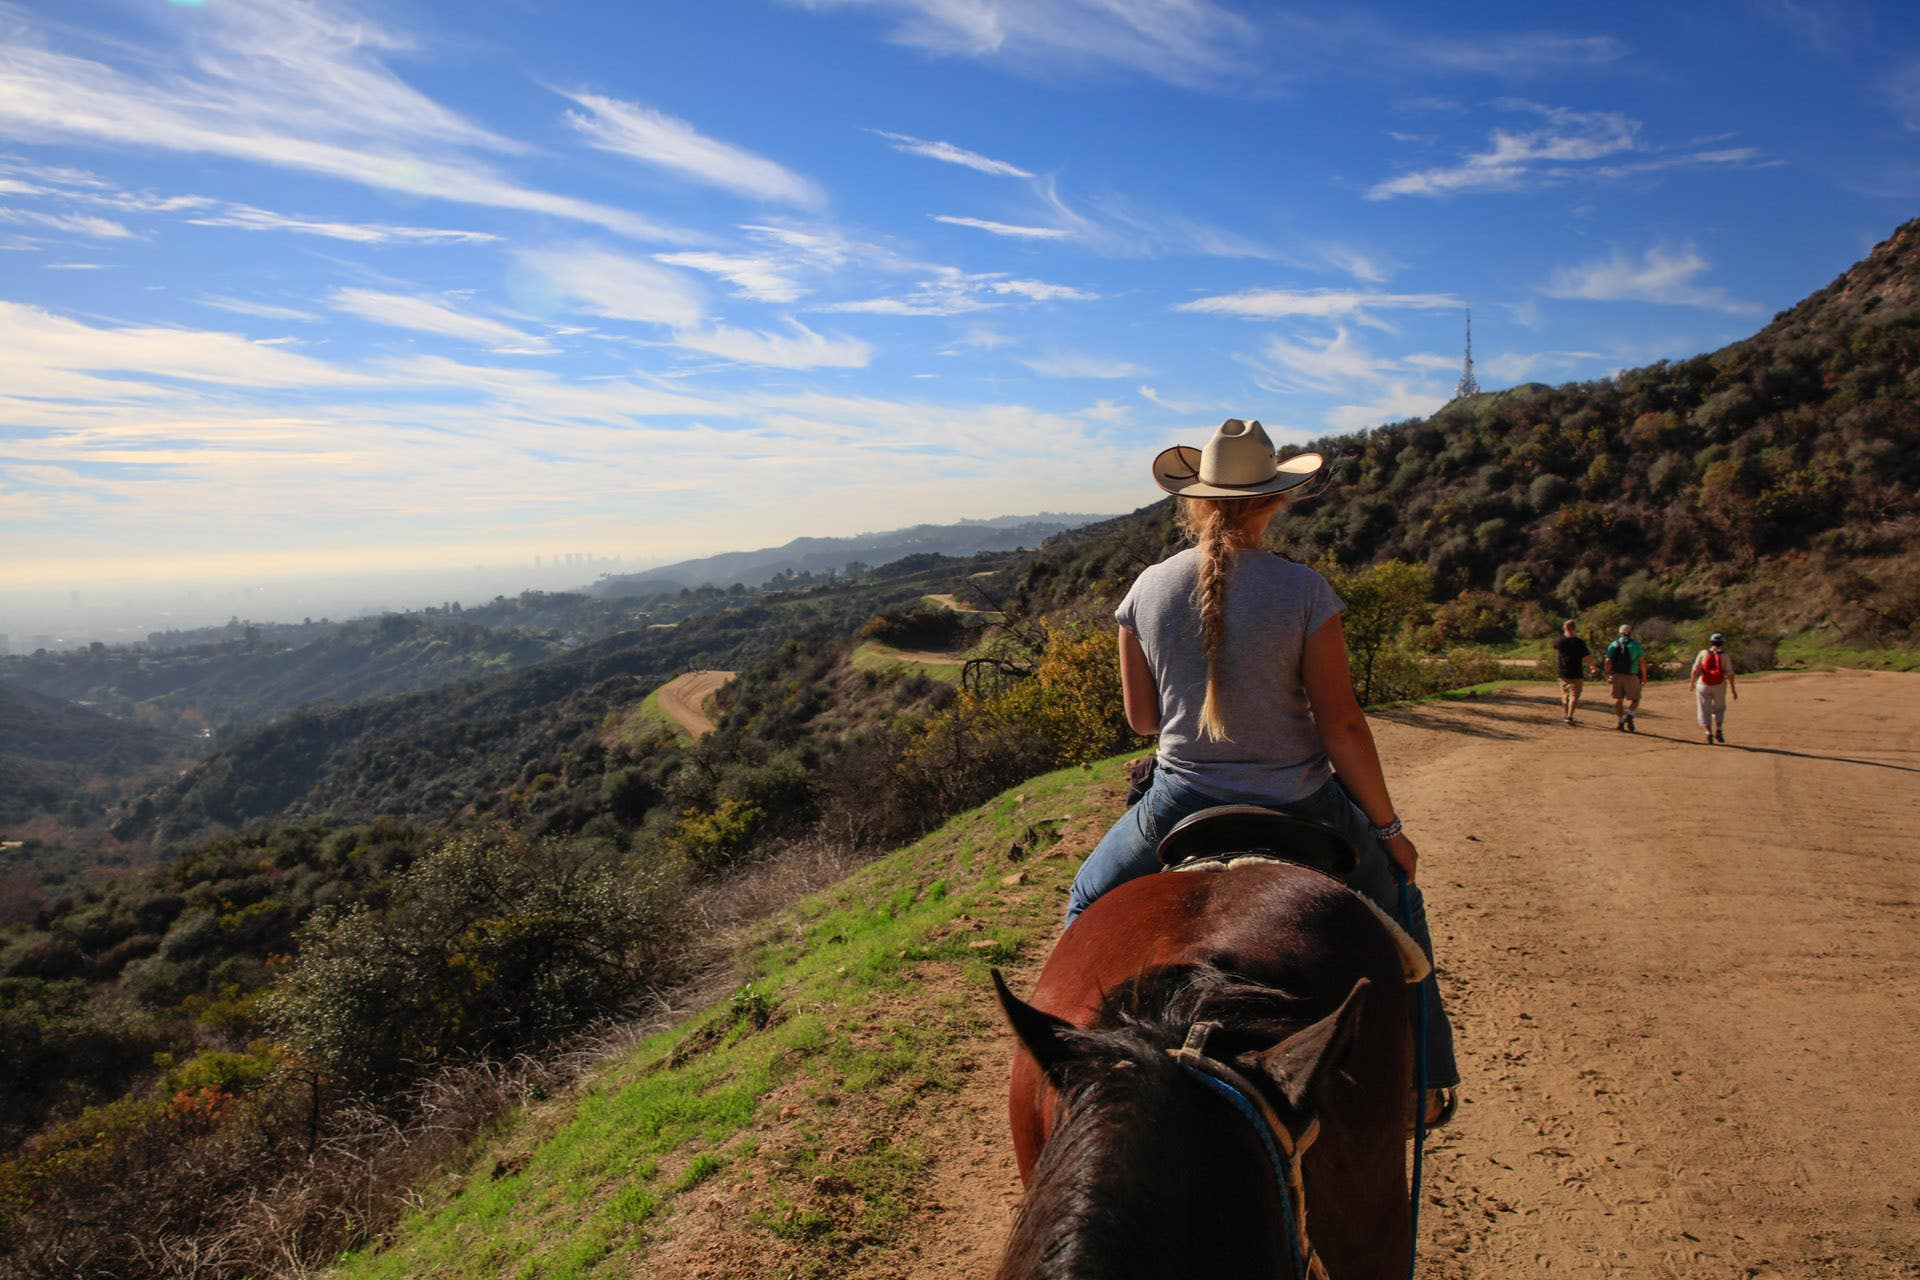 View from the saddle at Sunset Ranch Hollywood      Photo: Yuri Hasegawa